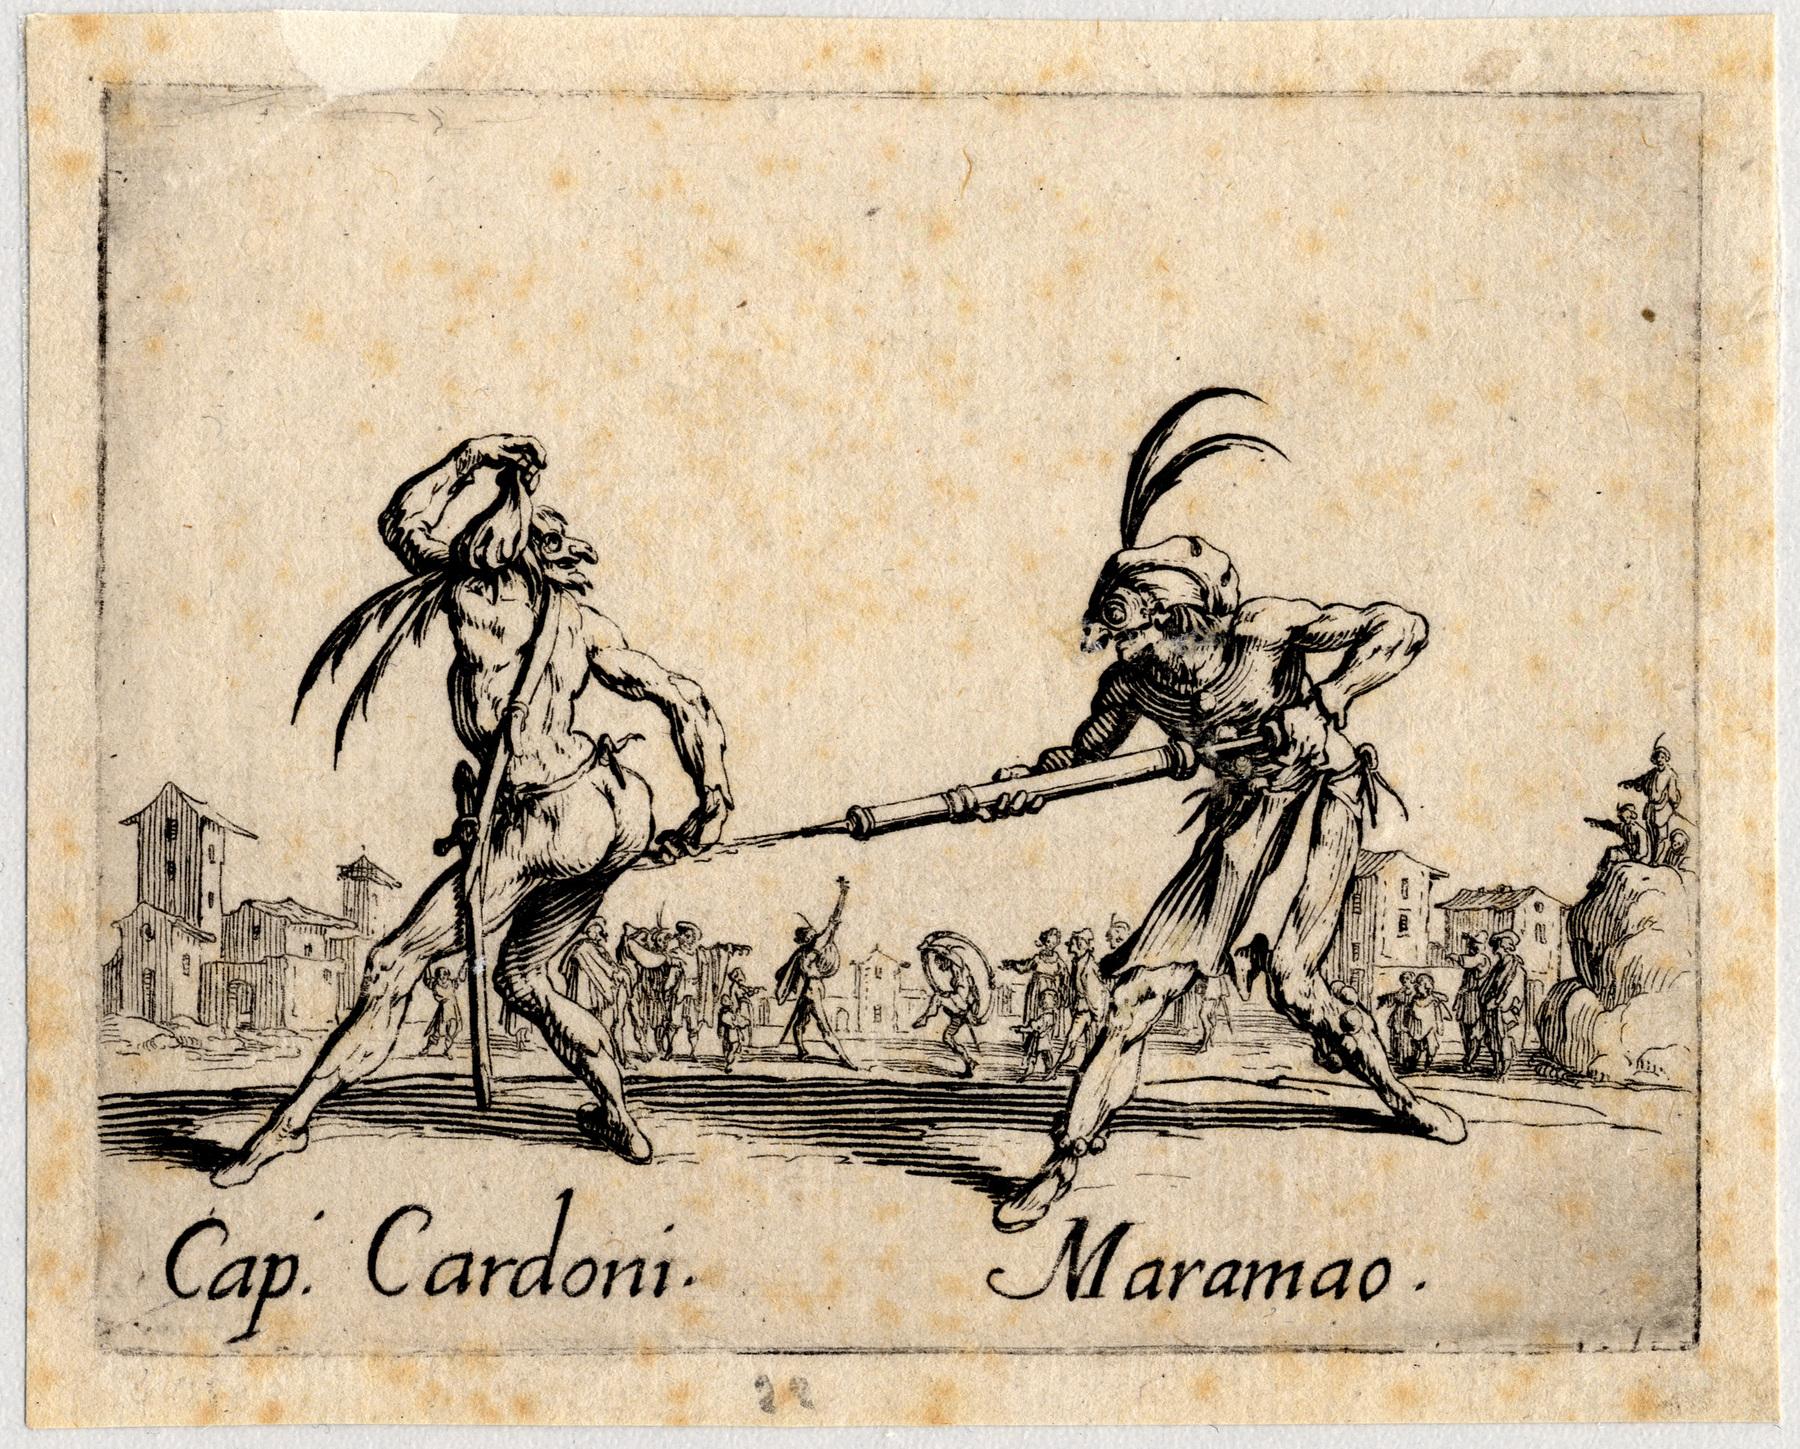 Contenu du Balli di Sfessania : Capitaine Cardoni, Maramao